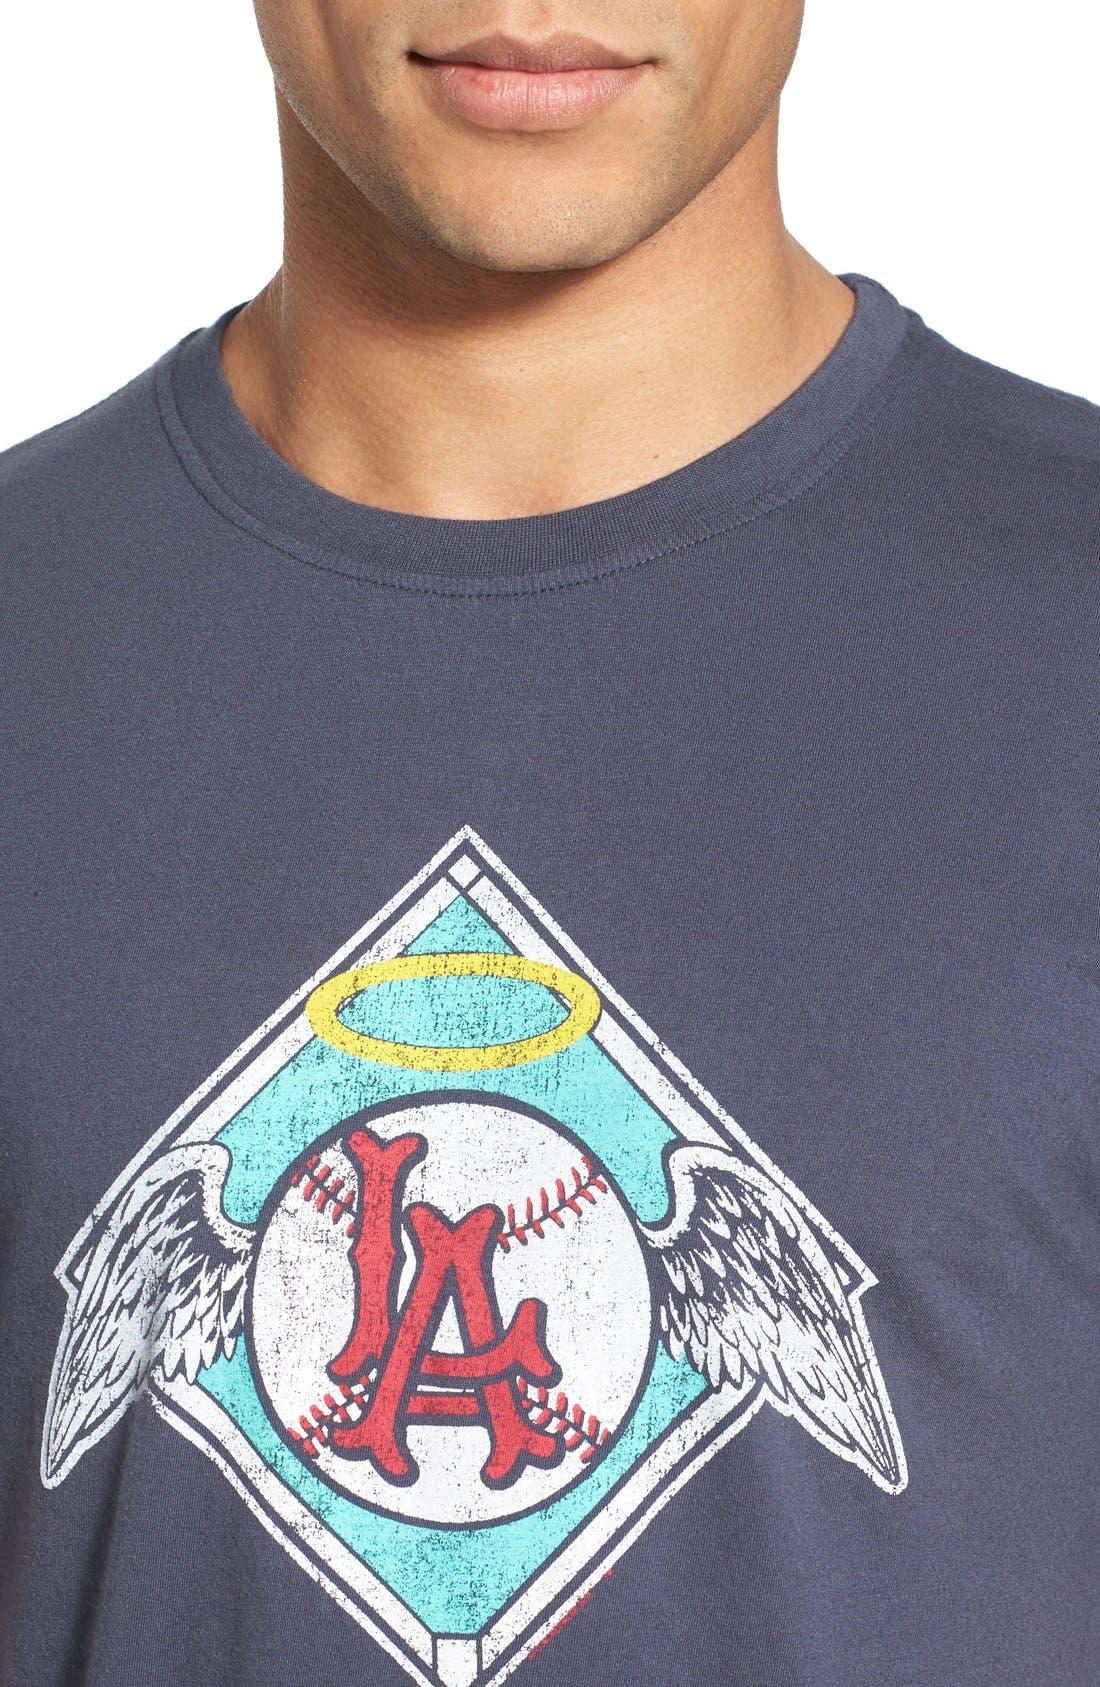 'Los Angeles Angels - Brass Tacks' Trim Fit T-Shirt,                             Alternate thumbnail 4, color,                             410